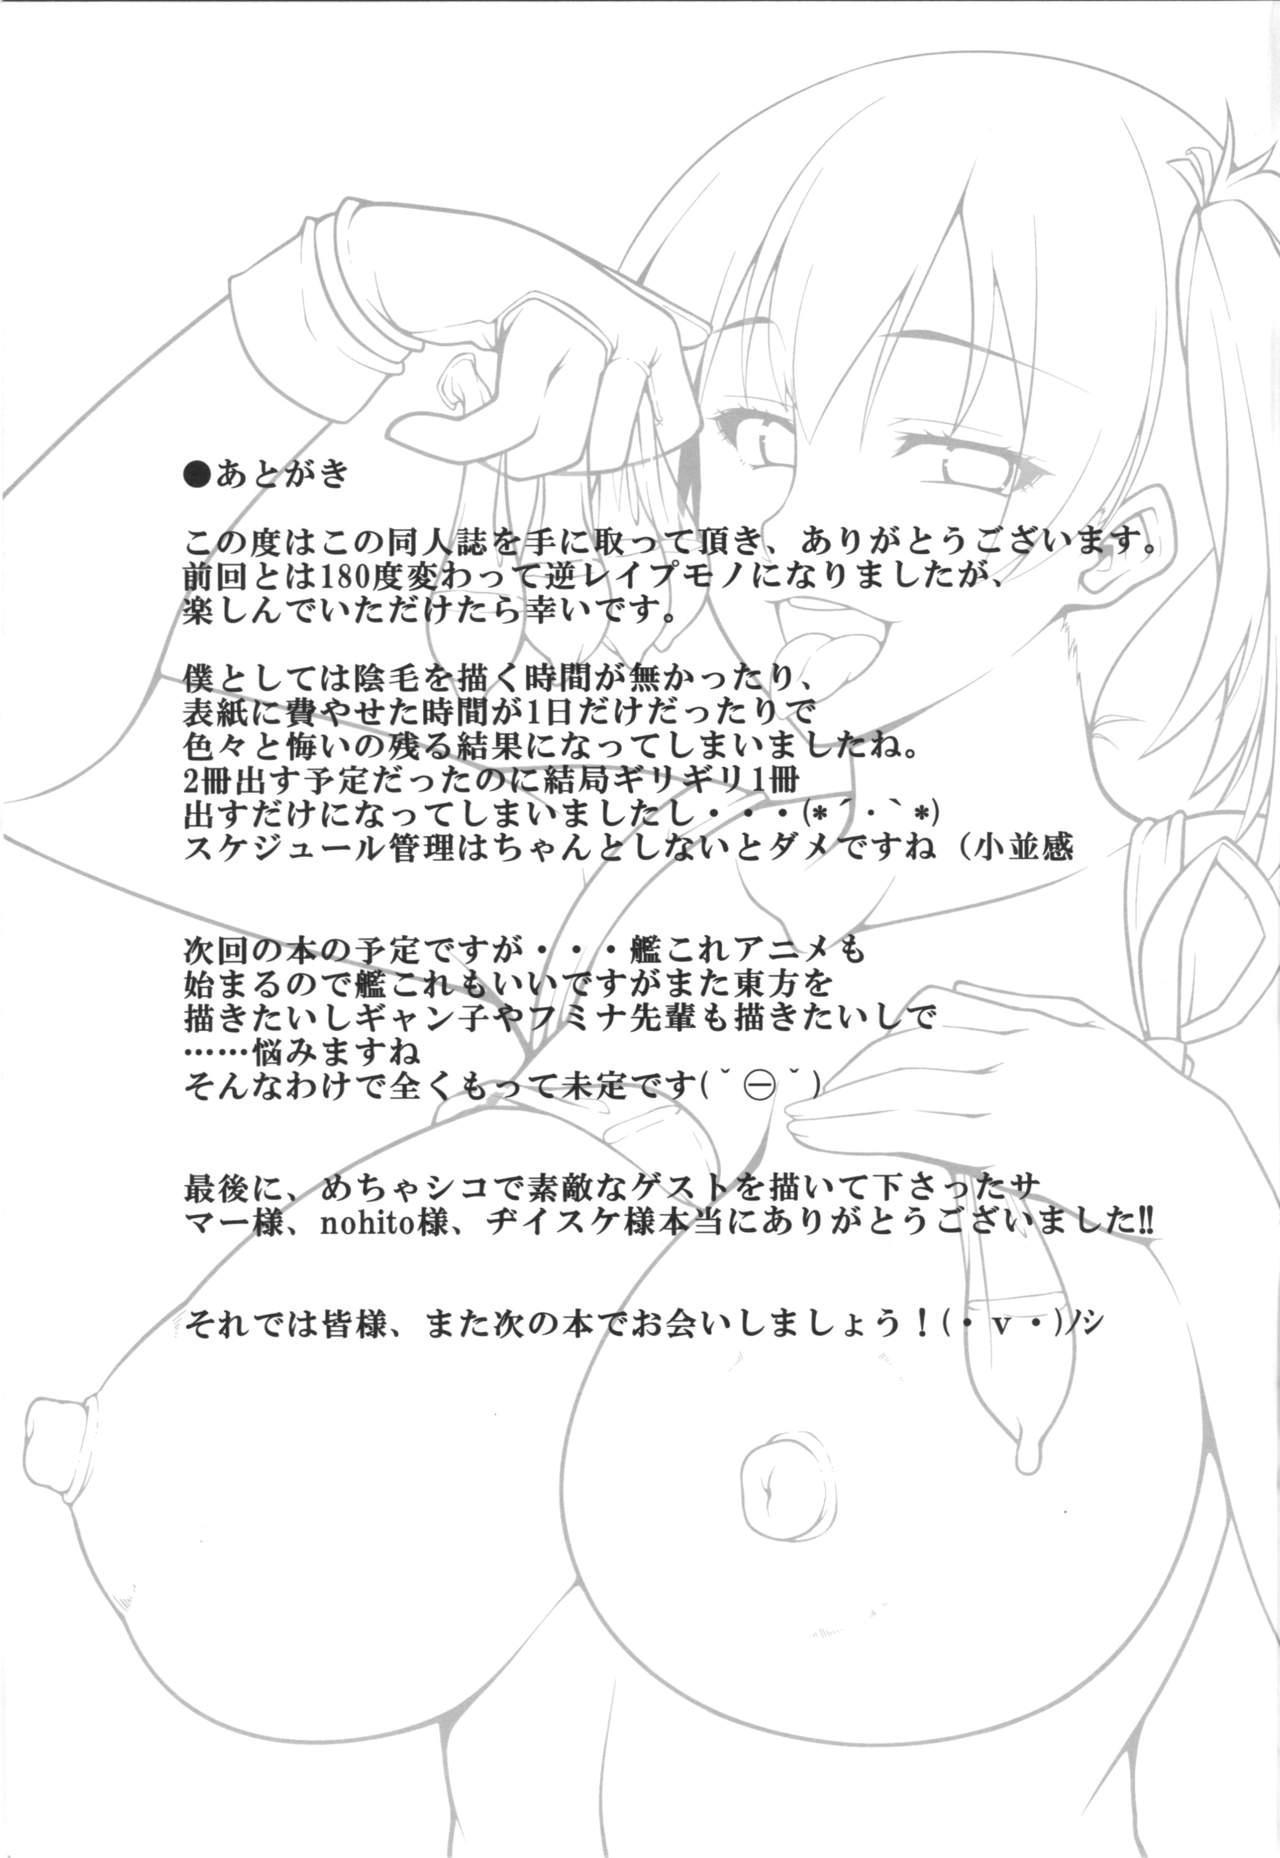 (C88) [Banana Koubou (Ao Banana)] Kaga-san wa Inran Onee-chan (Kantai Collection -KanColle-) [English] [hardcase8translates] (Updated 15/9/2020) 23